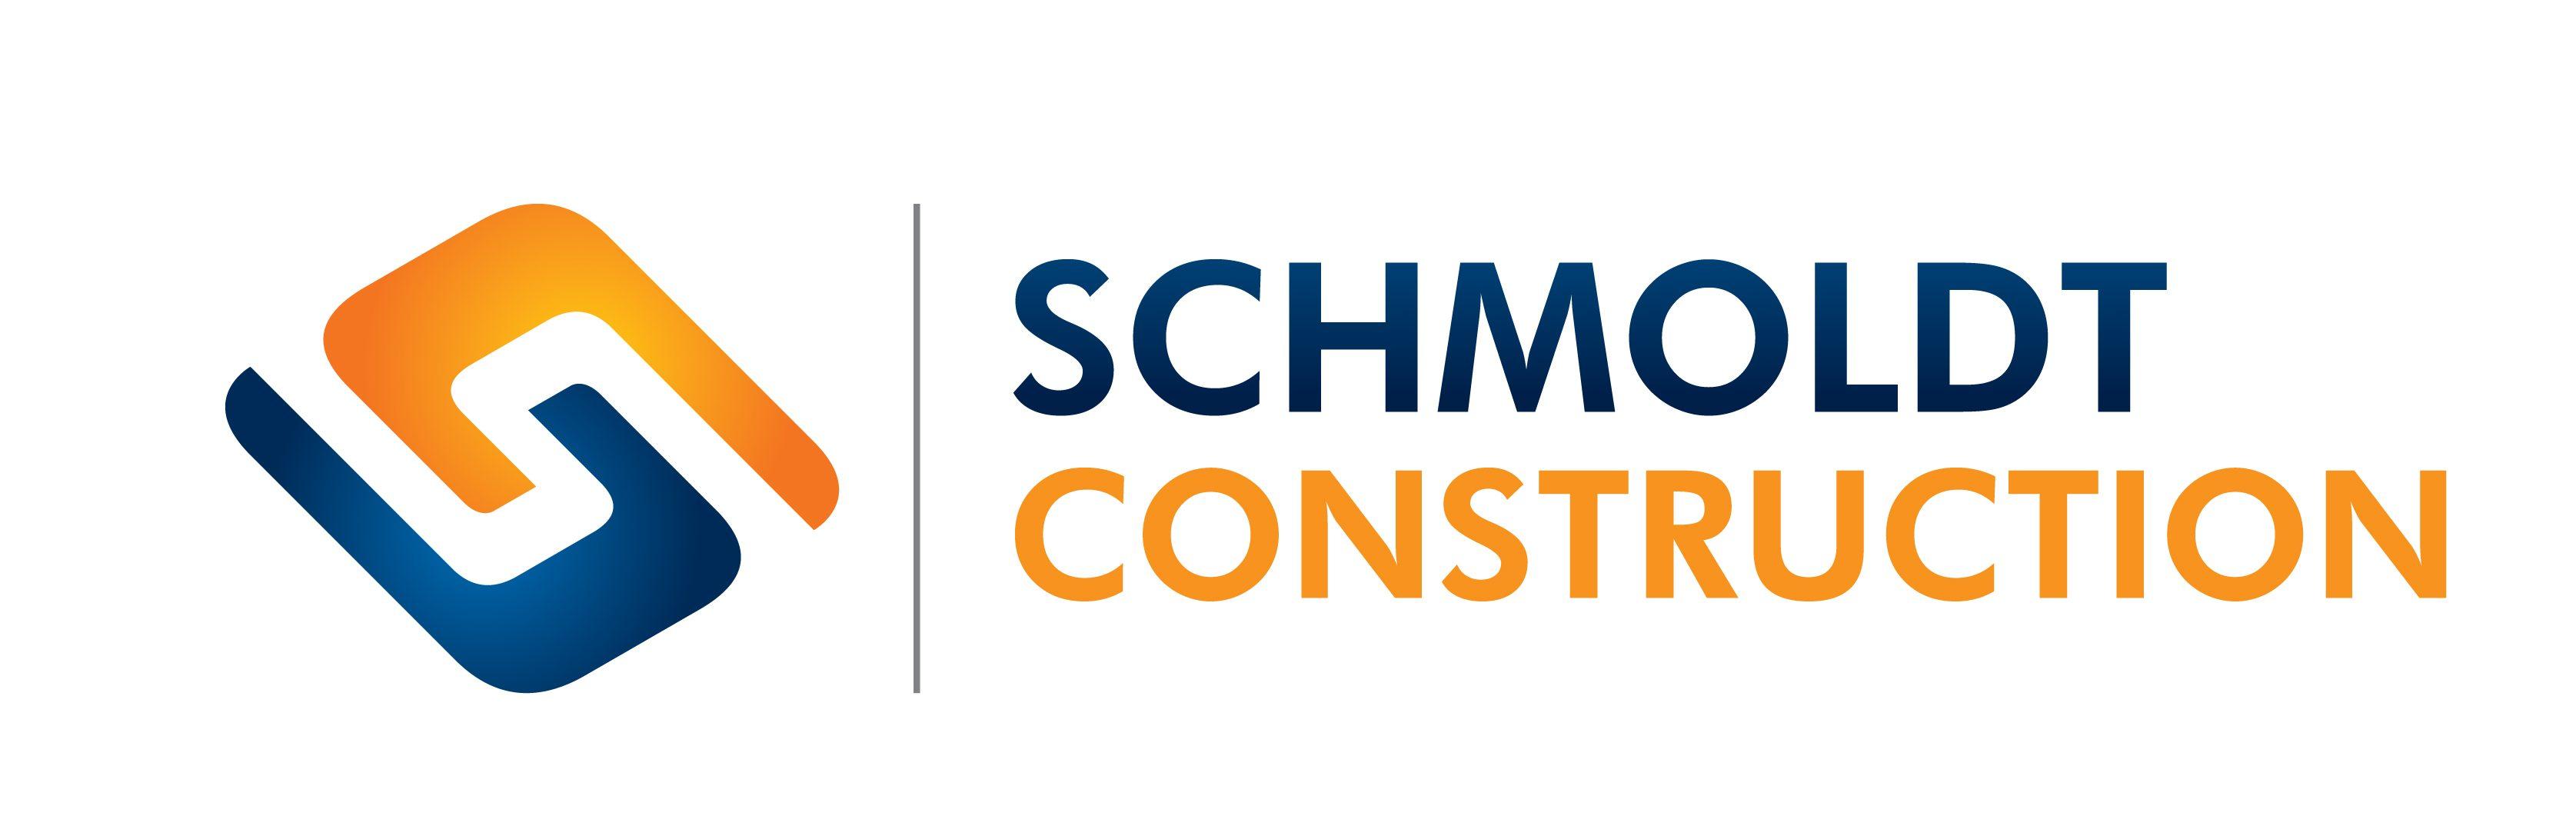 Schmoldt Construction